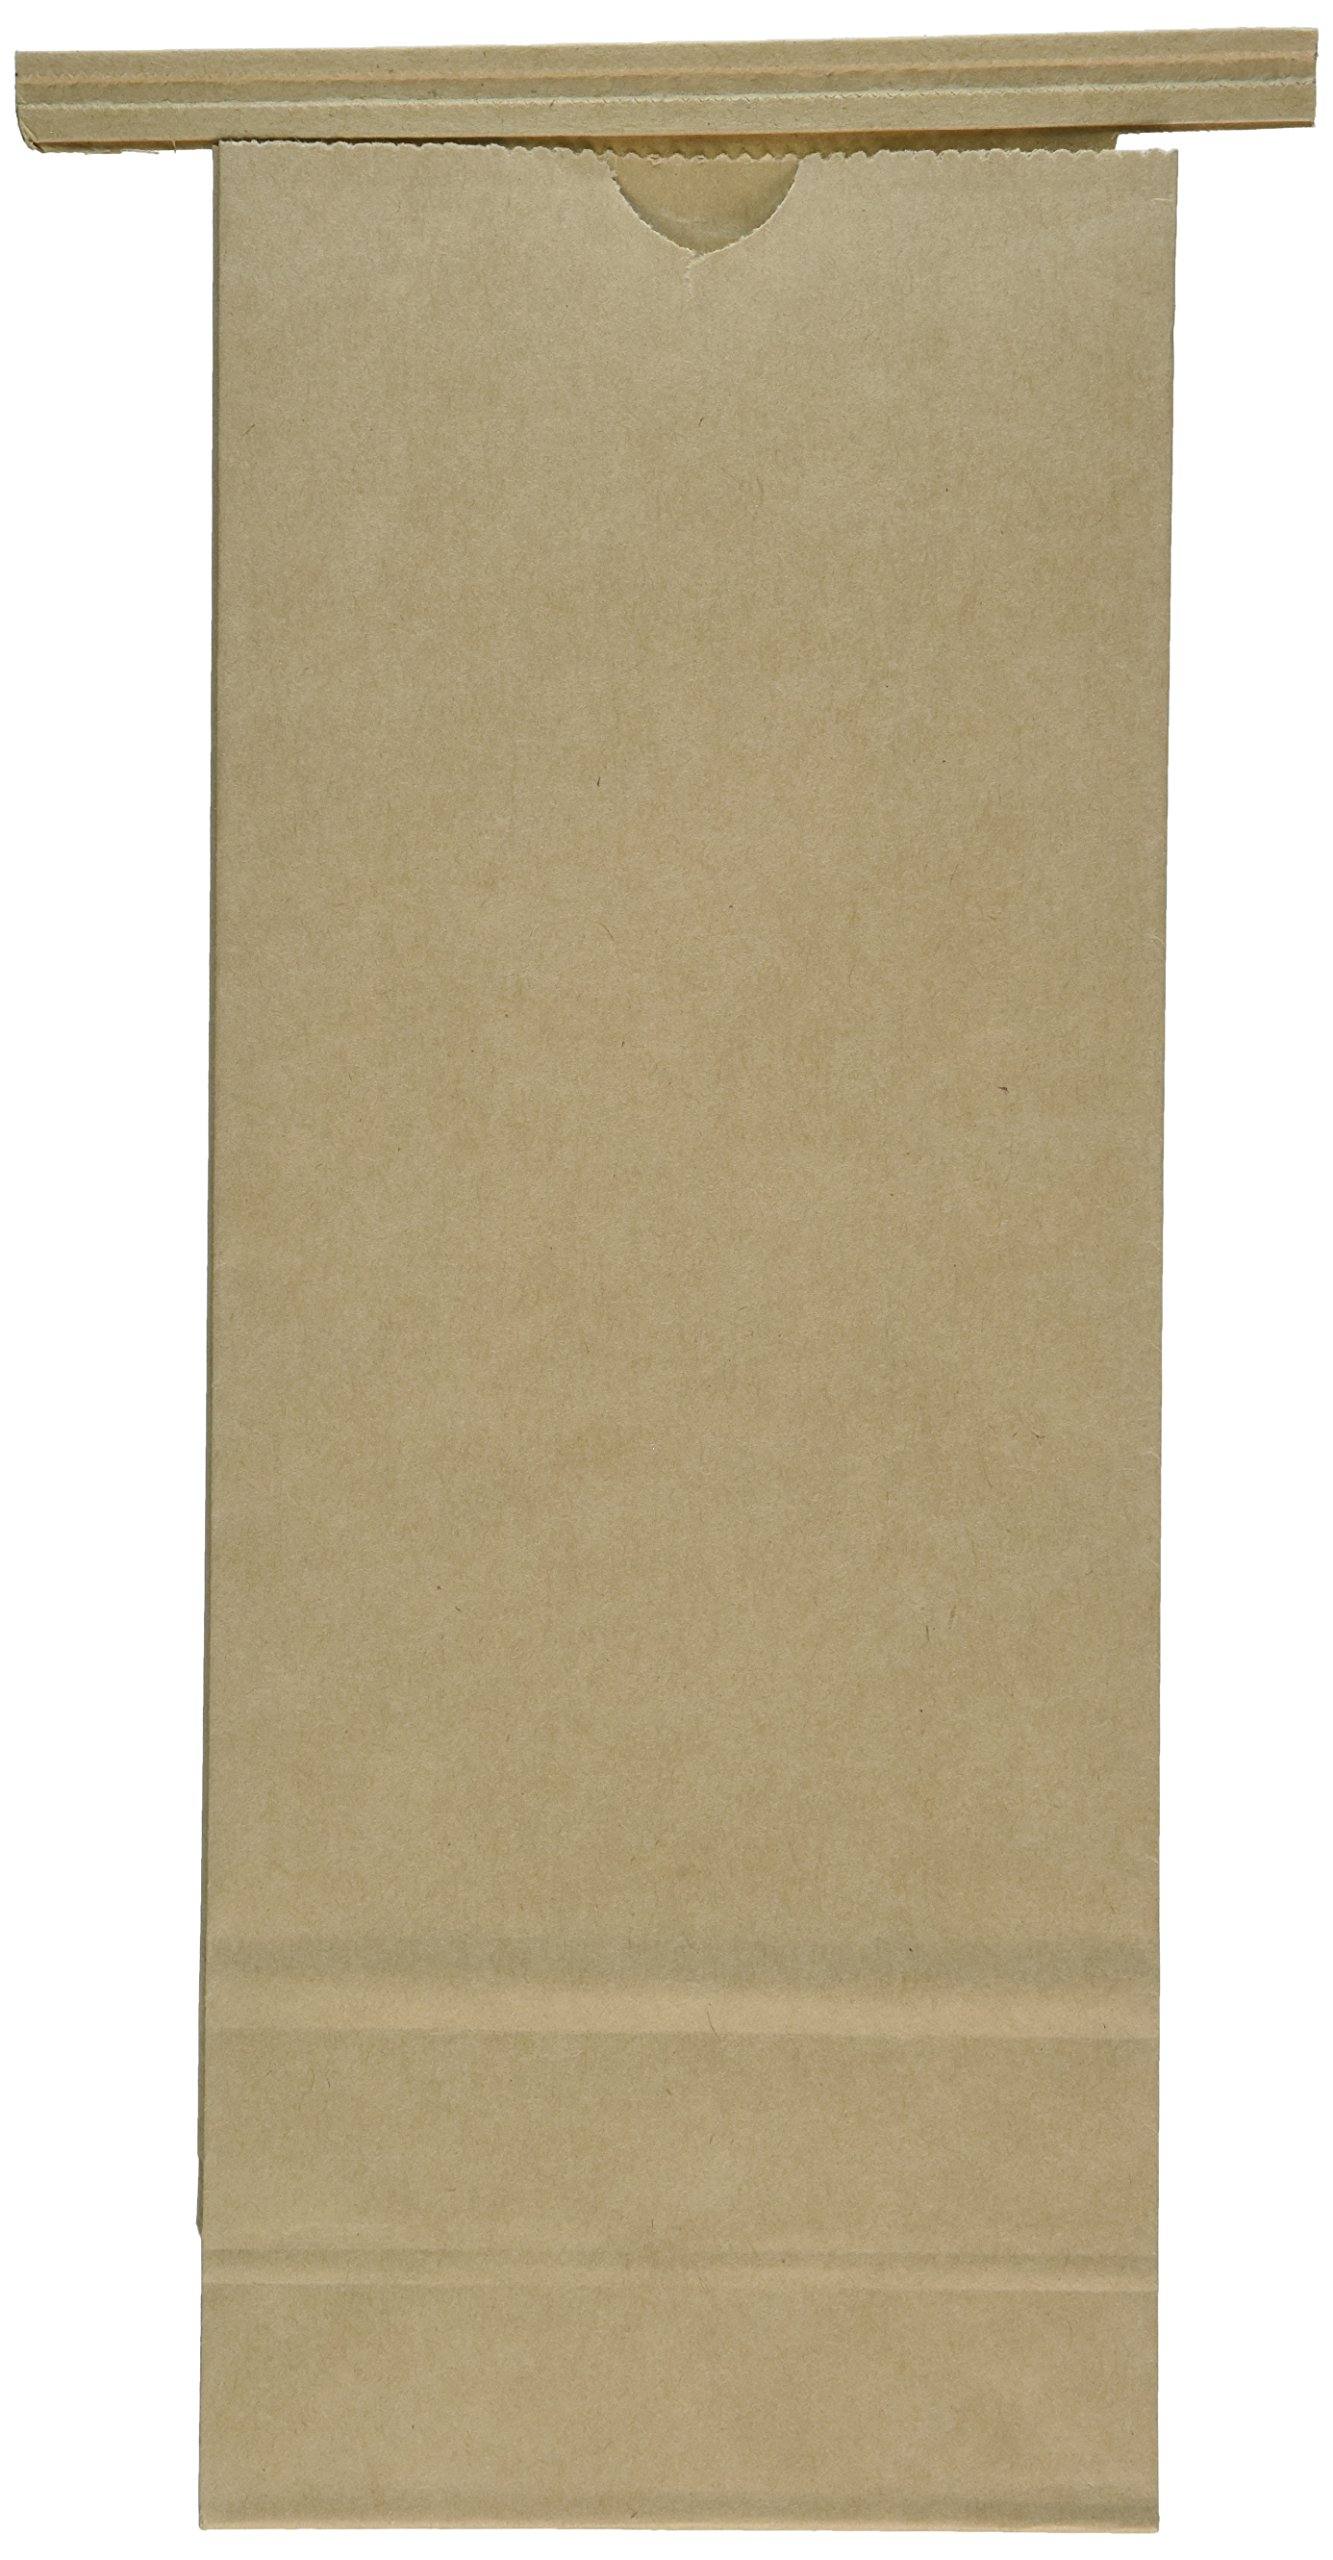 kraft tin tie coffee bags 1 lb 50 pcs (Brown)